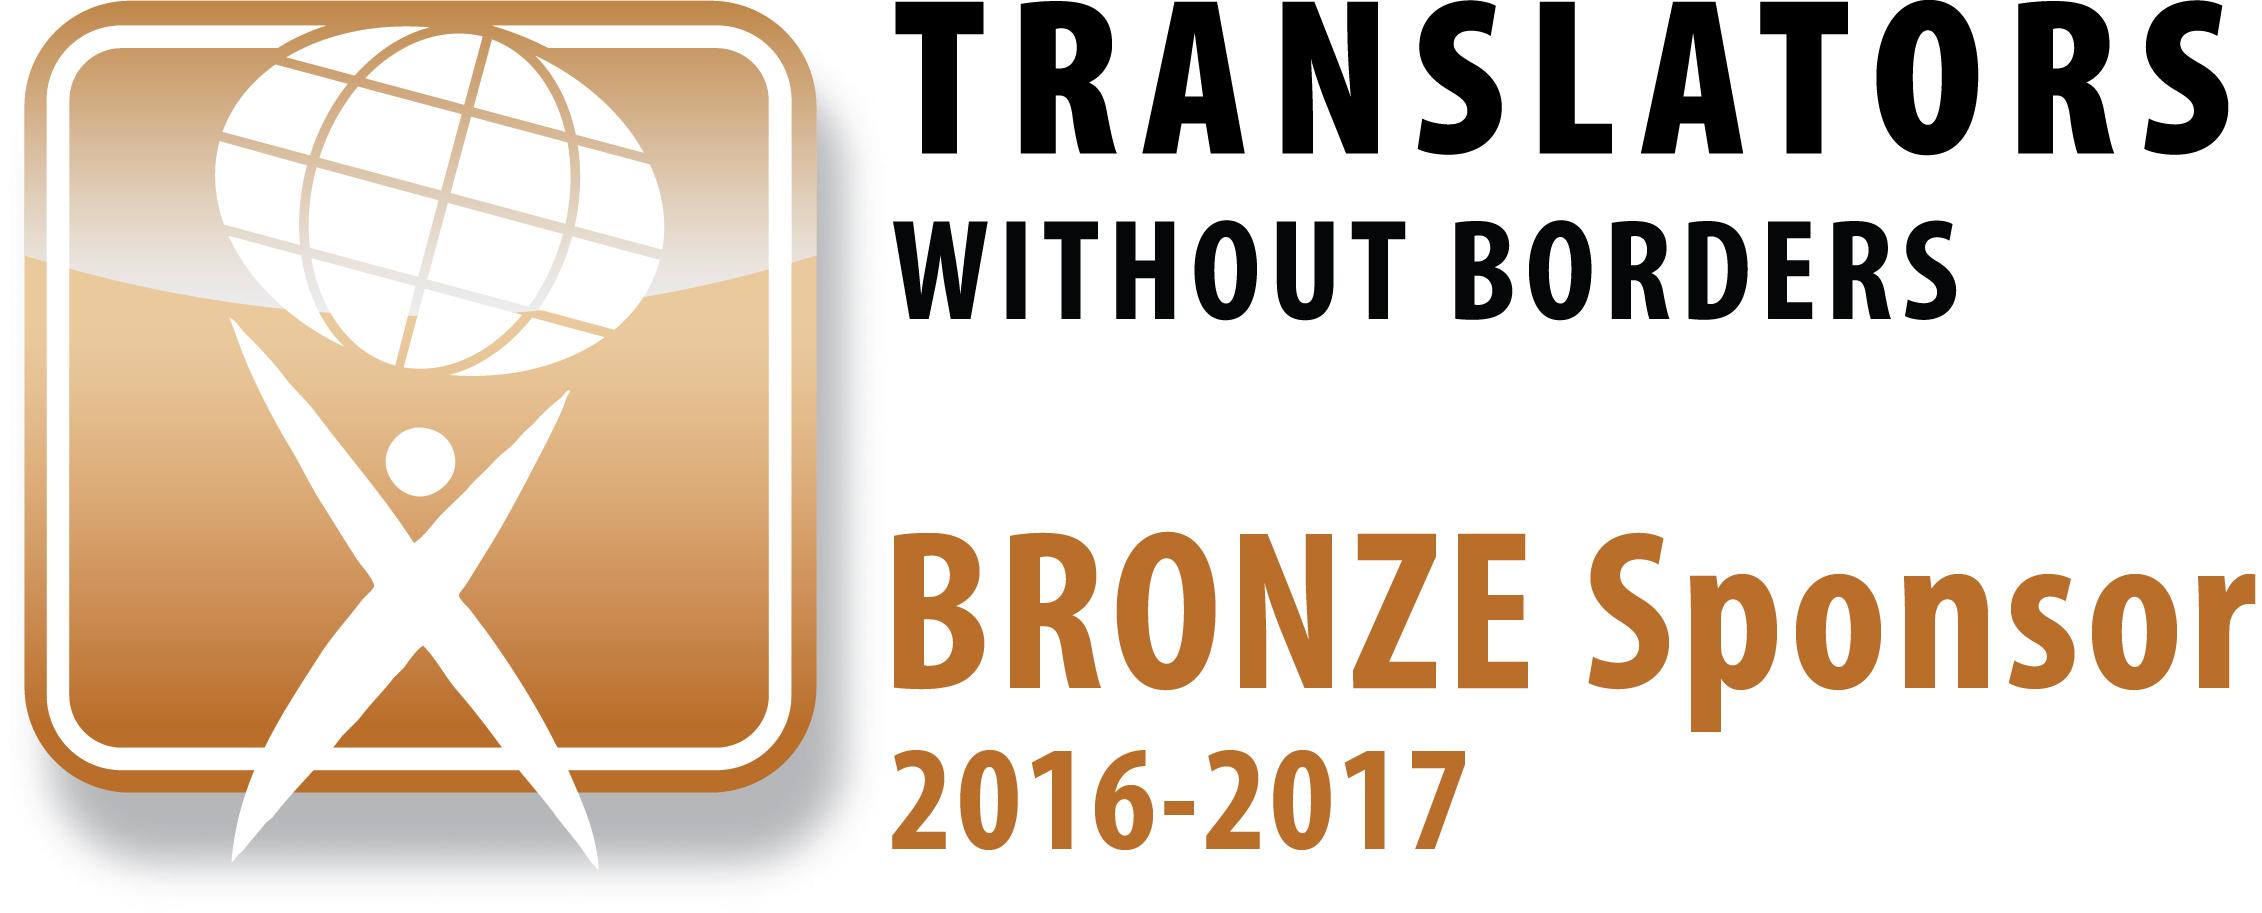 Translators without Borders Bronze Sponsor